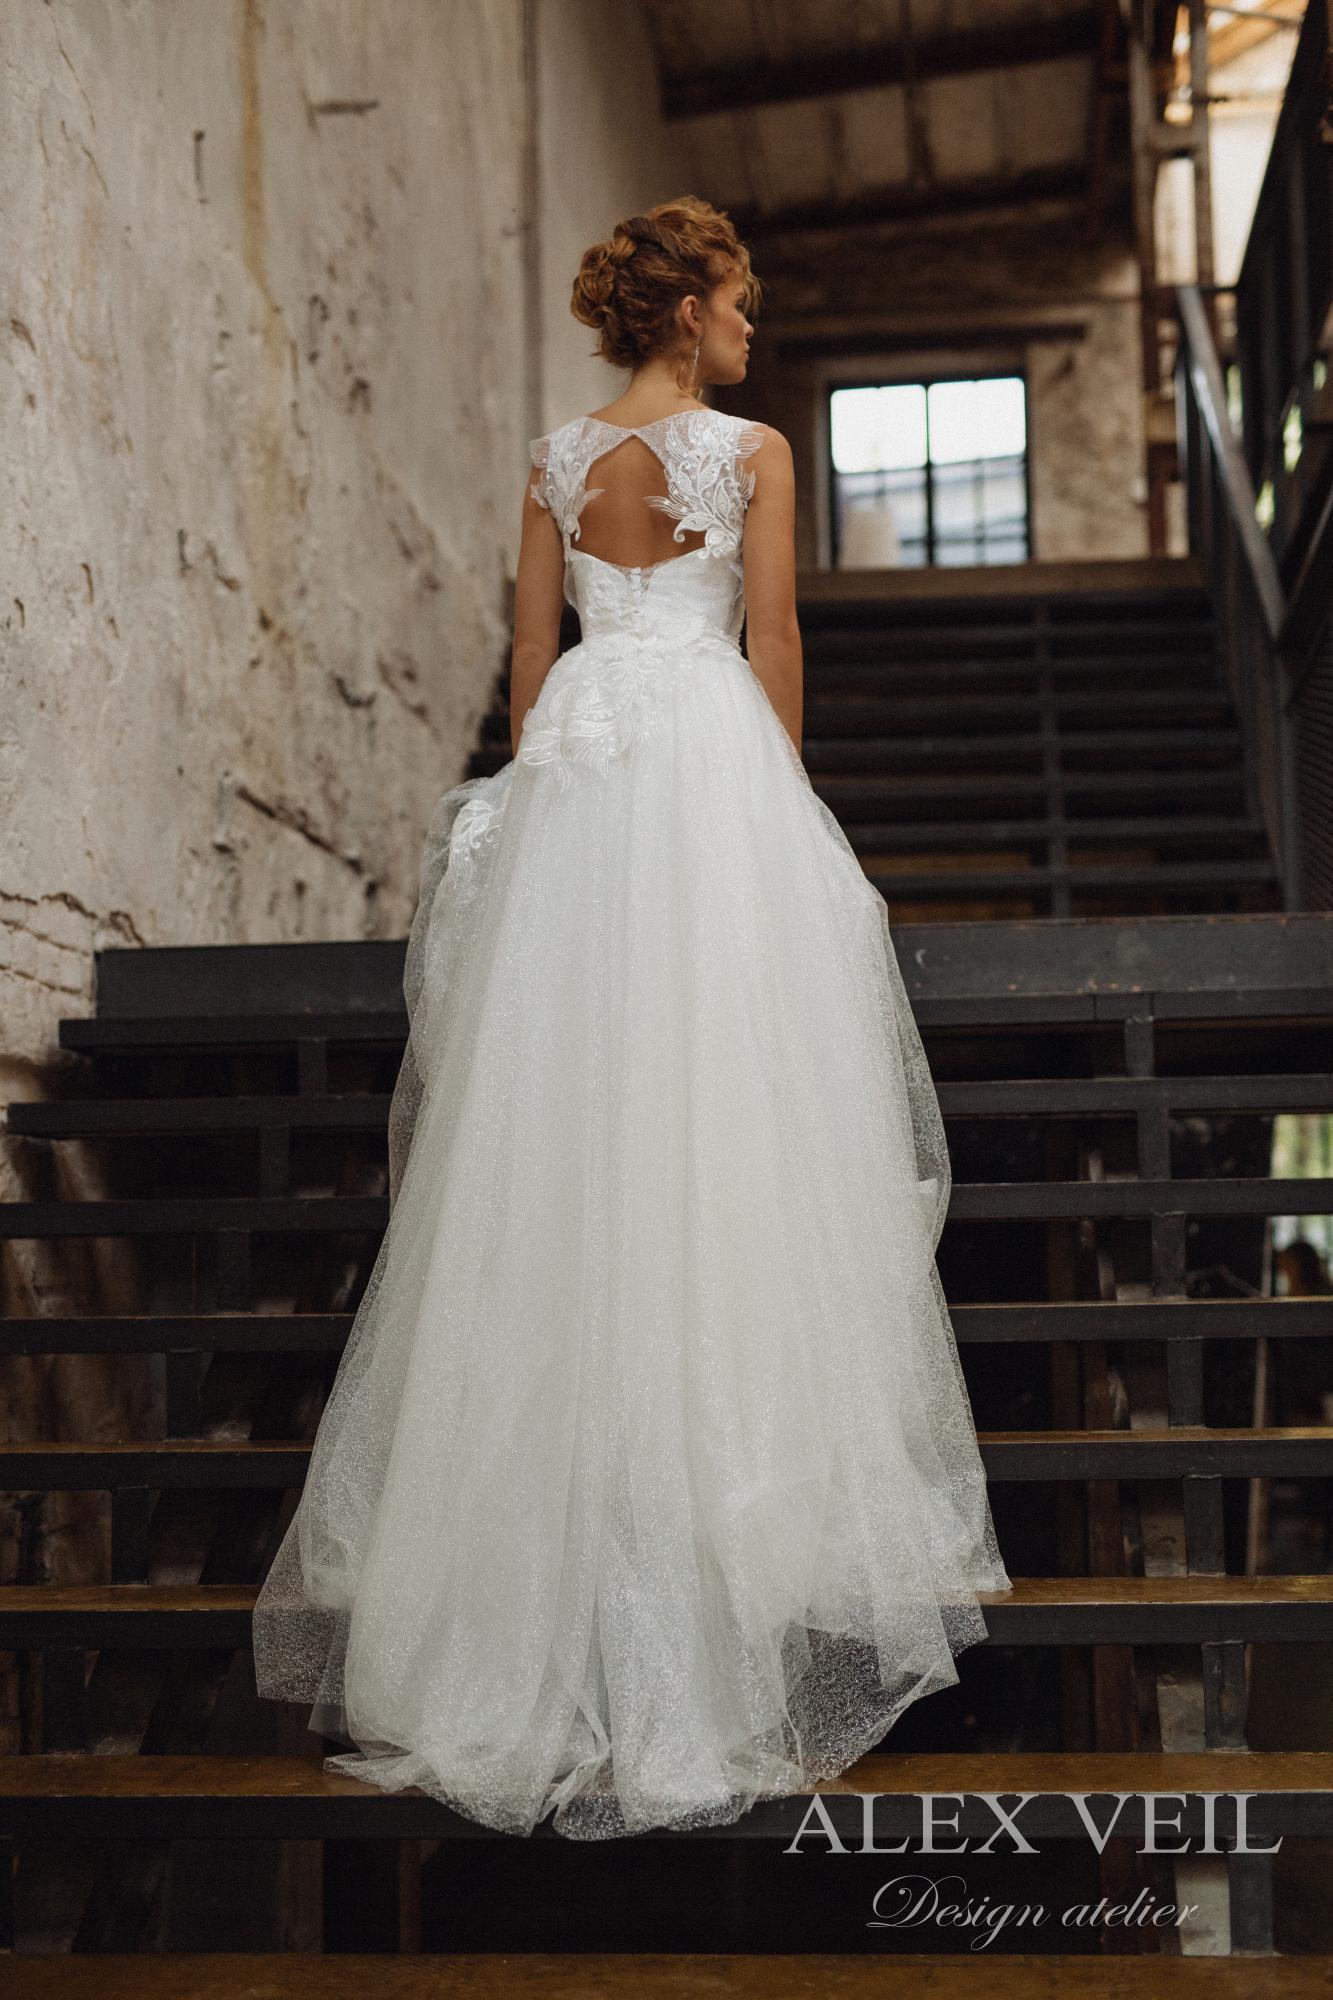 Alex Veil Bridal Eshli Wedding Dress – Brand New & Never Worn